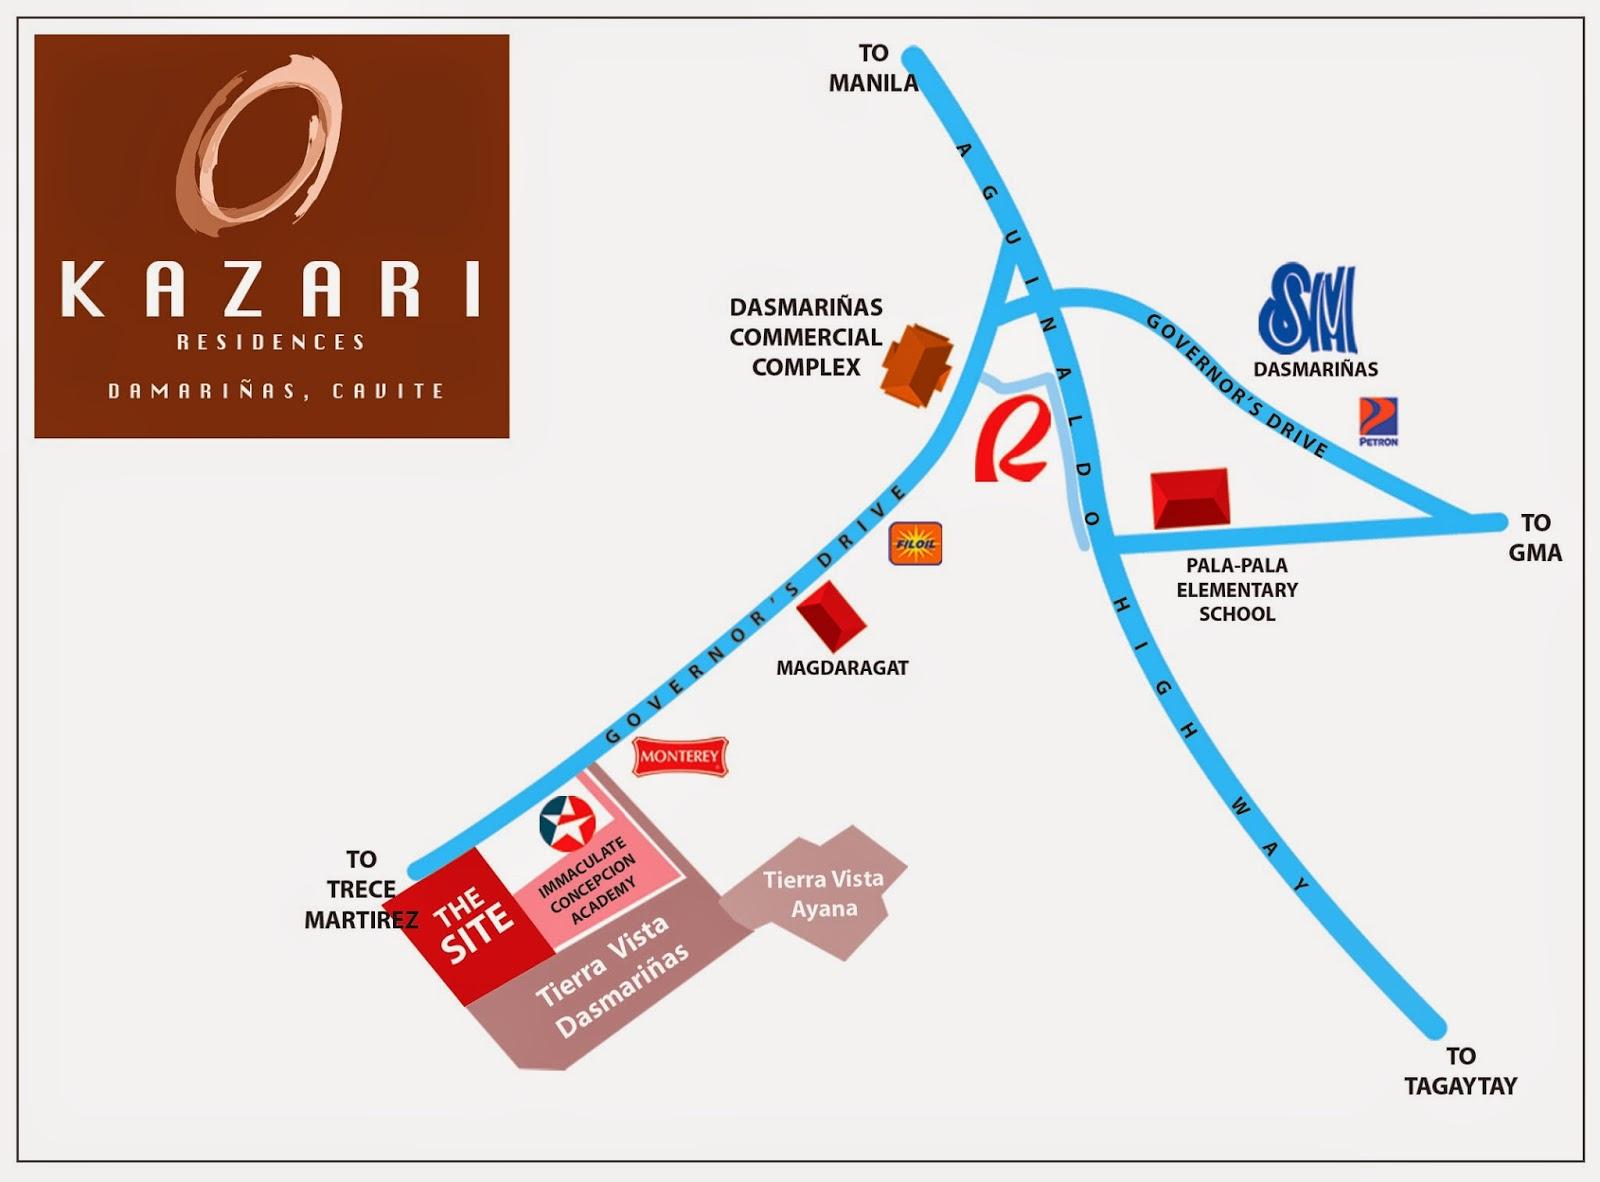 Camella silang tagaytay drina house and lot for sale in tagaytay city - Kazari Residences Vicinity Map